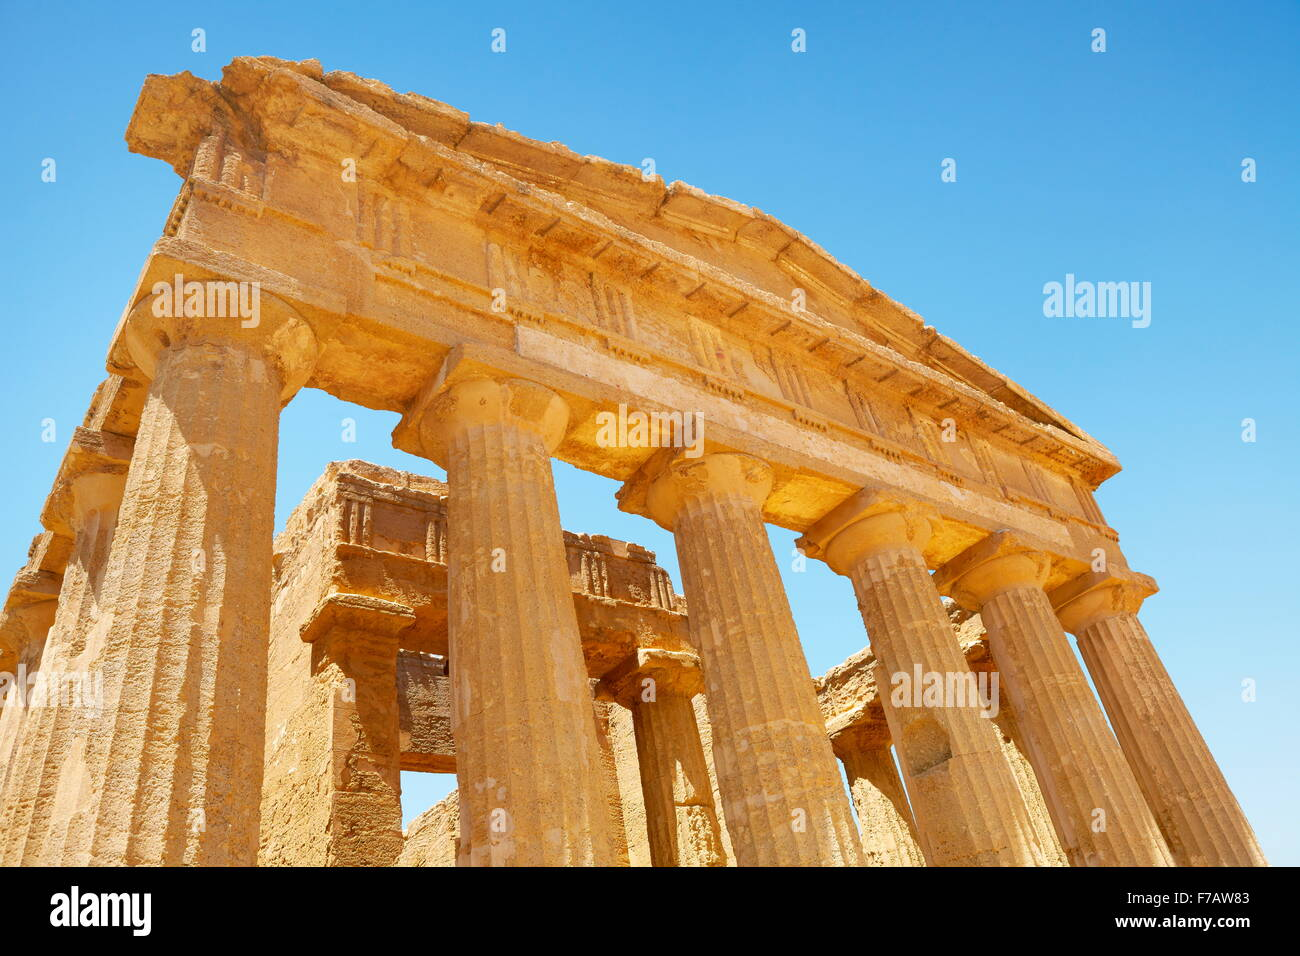 Tempel der Concordia, Tal der Tempel (Valle dei Templi), UNESCO-Agrigento, Sizilien, Italien Stockbild